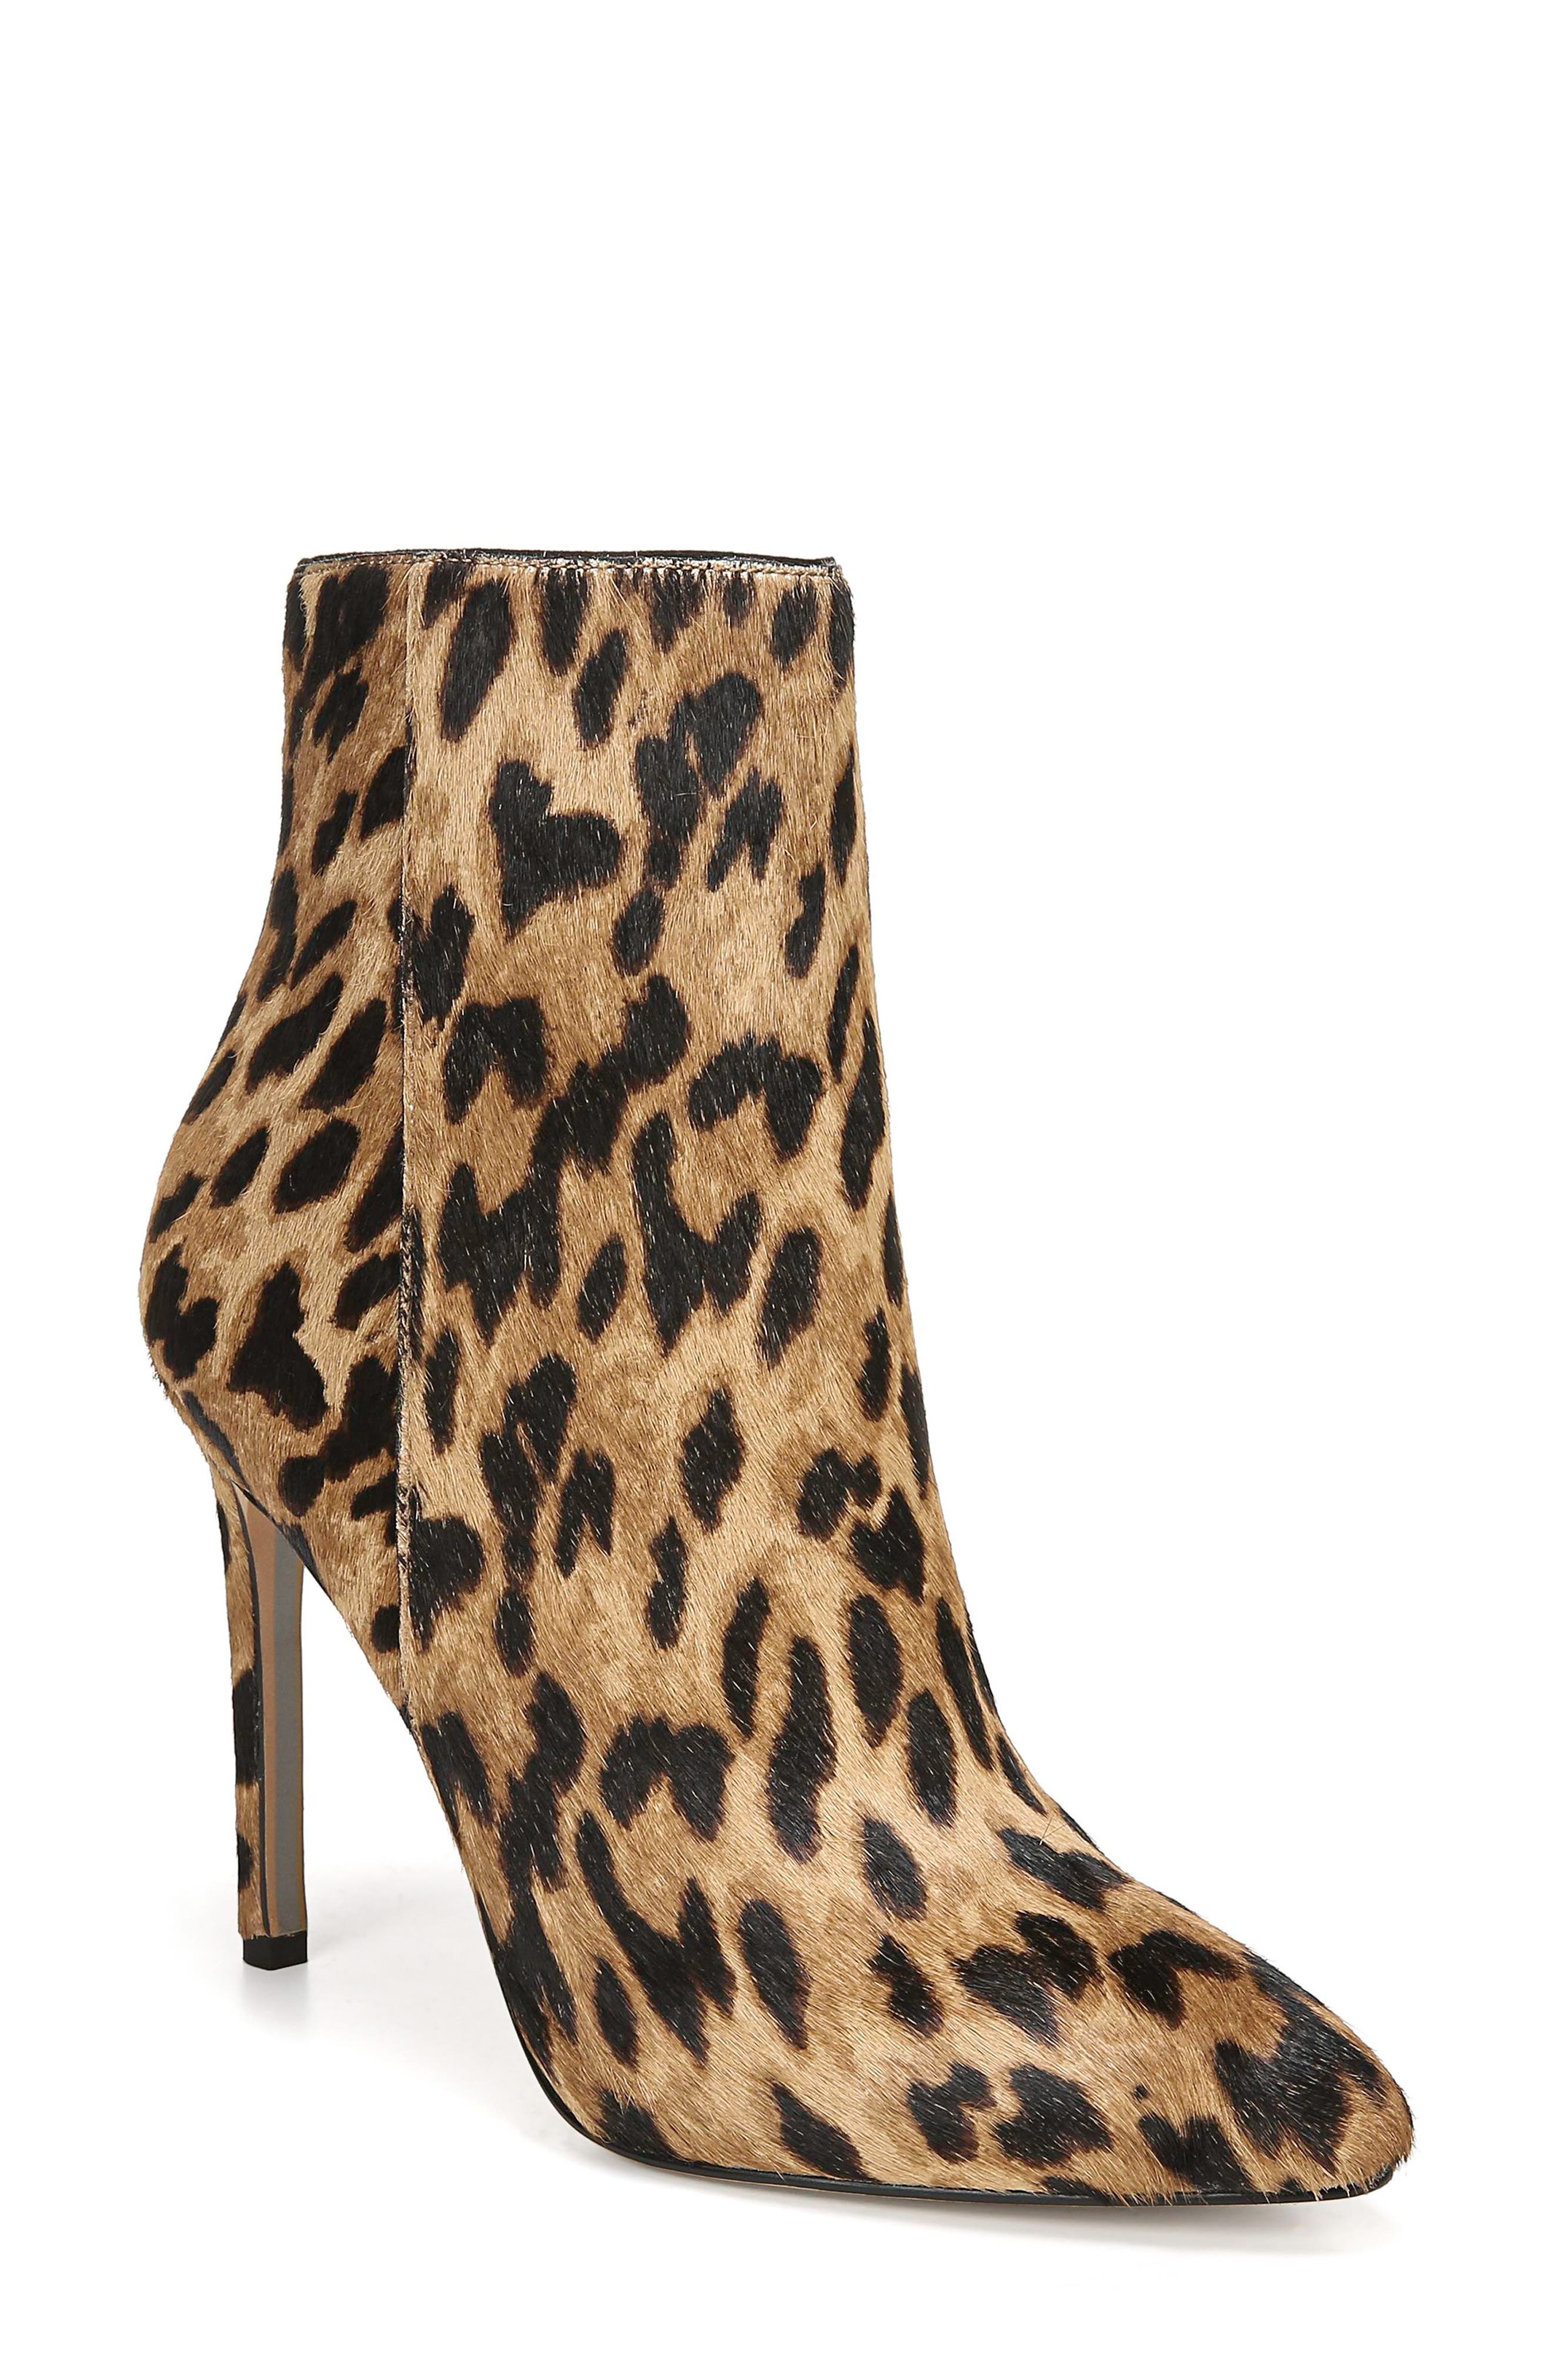 Sam Edelman Boots Wren Almond Toe Genuine Calf Hair Bootie